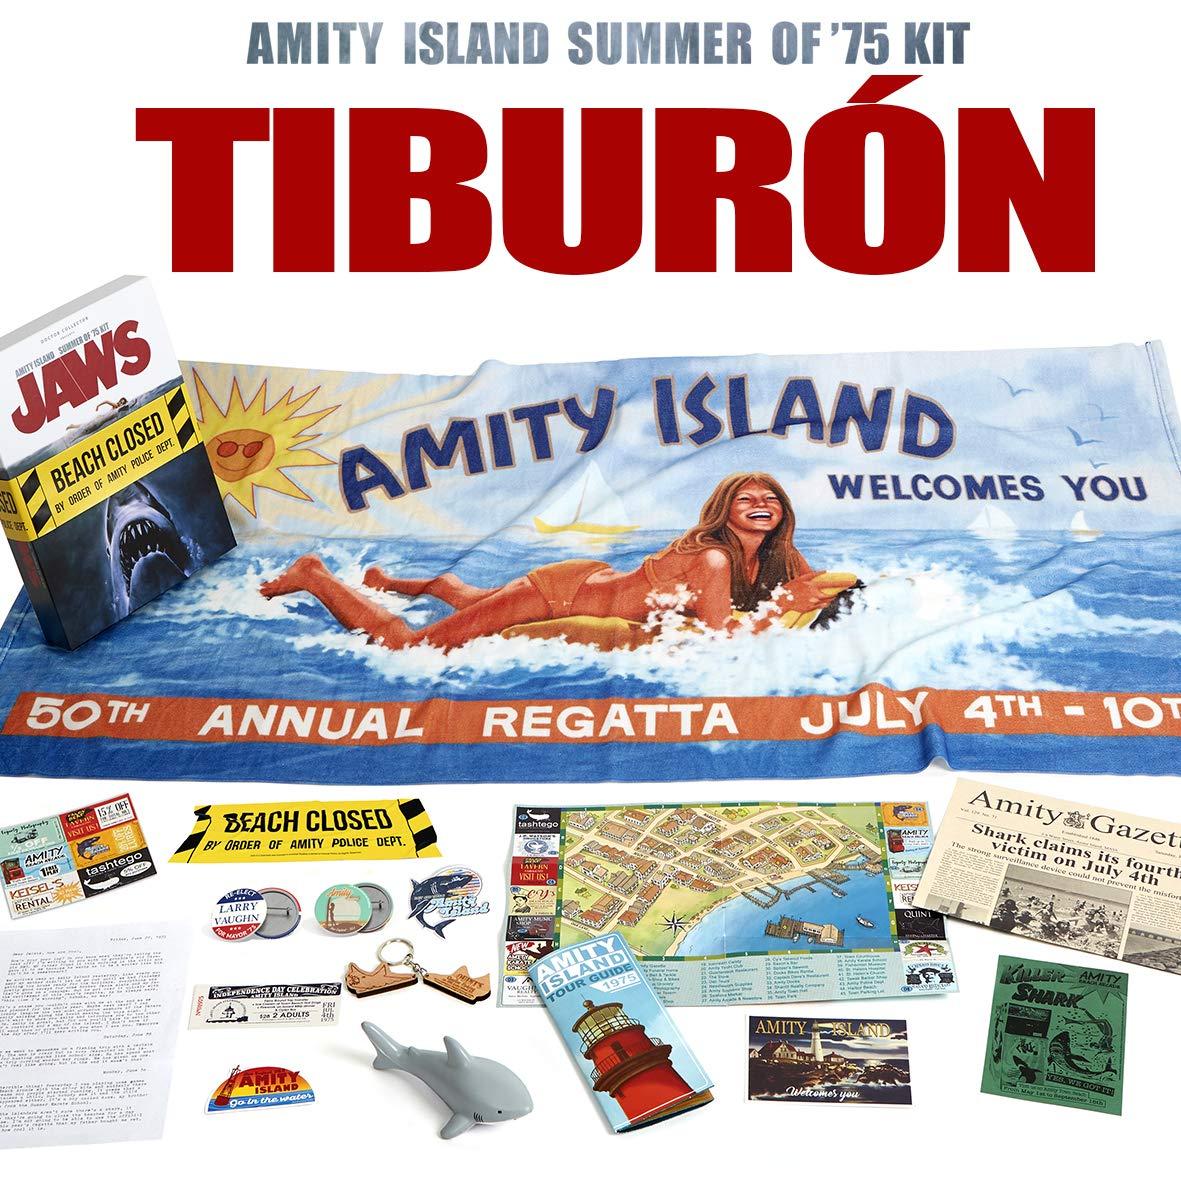 Doctor Collector Tiburón - Amity Island Summer of 75 Kit ...